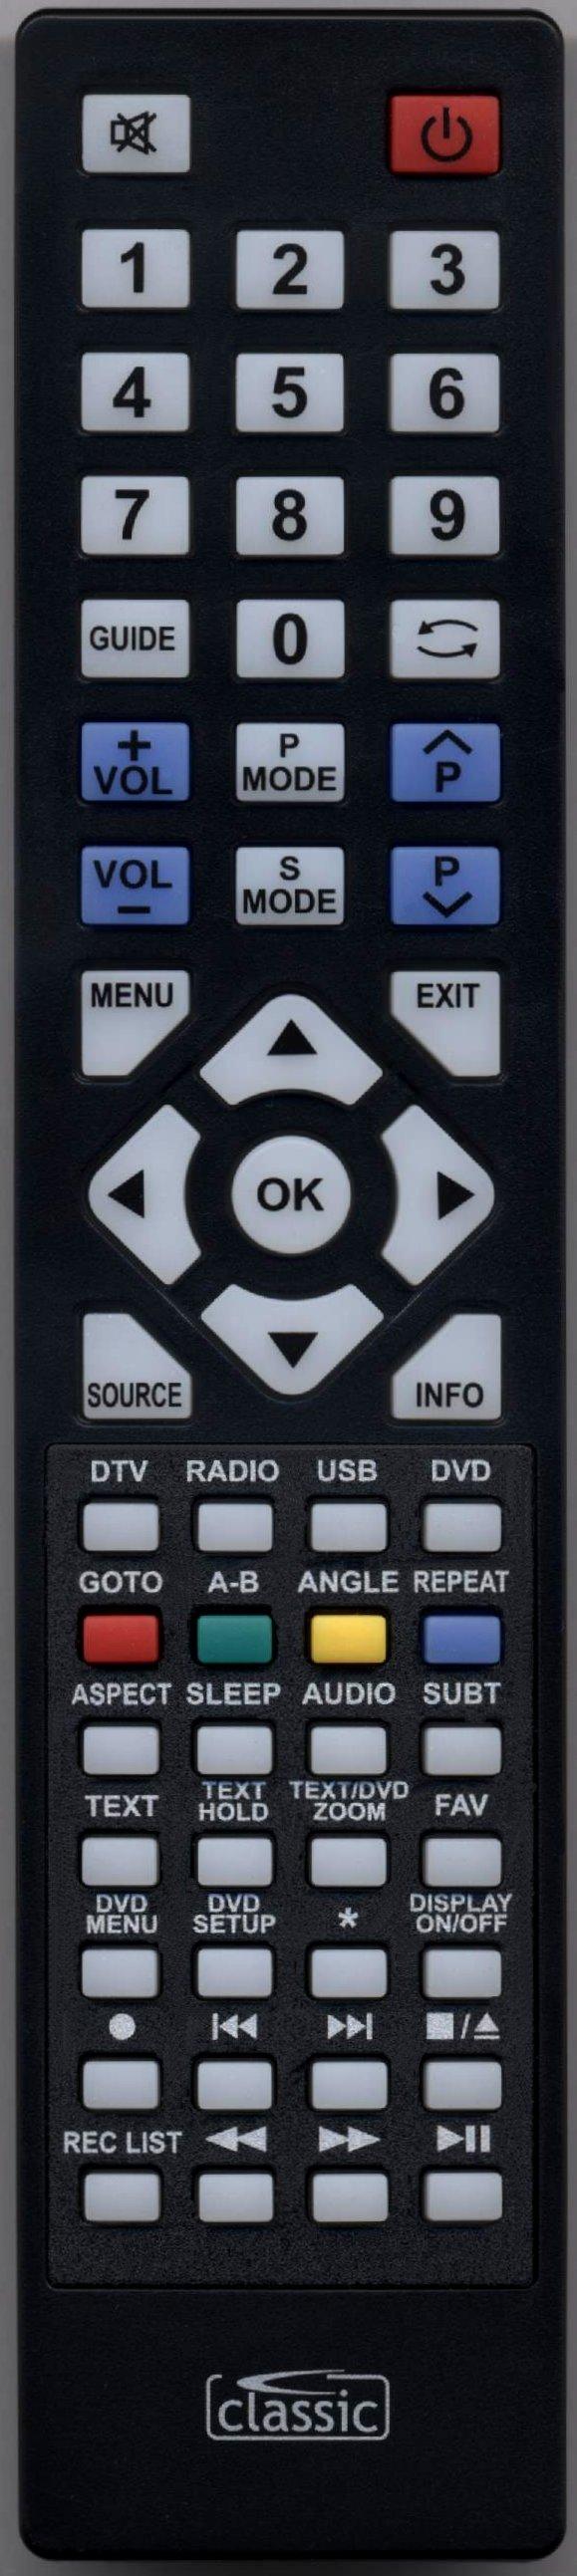 BLAUPUNKT 39/210I-GB-5B-FHCUP-UK Remote Control Alternative